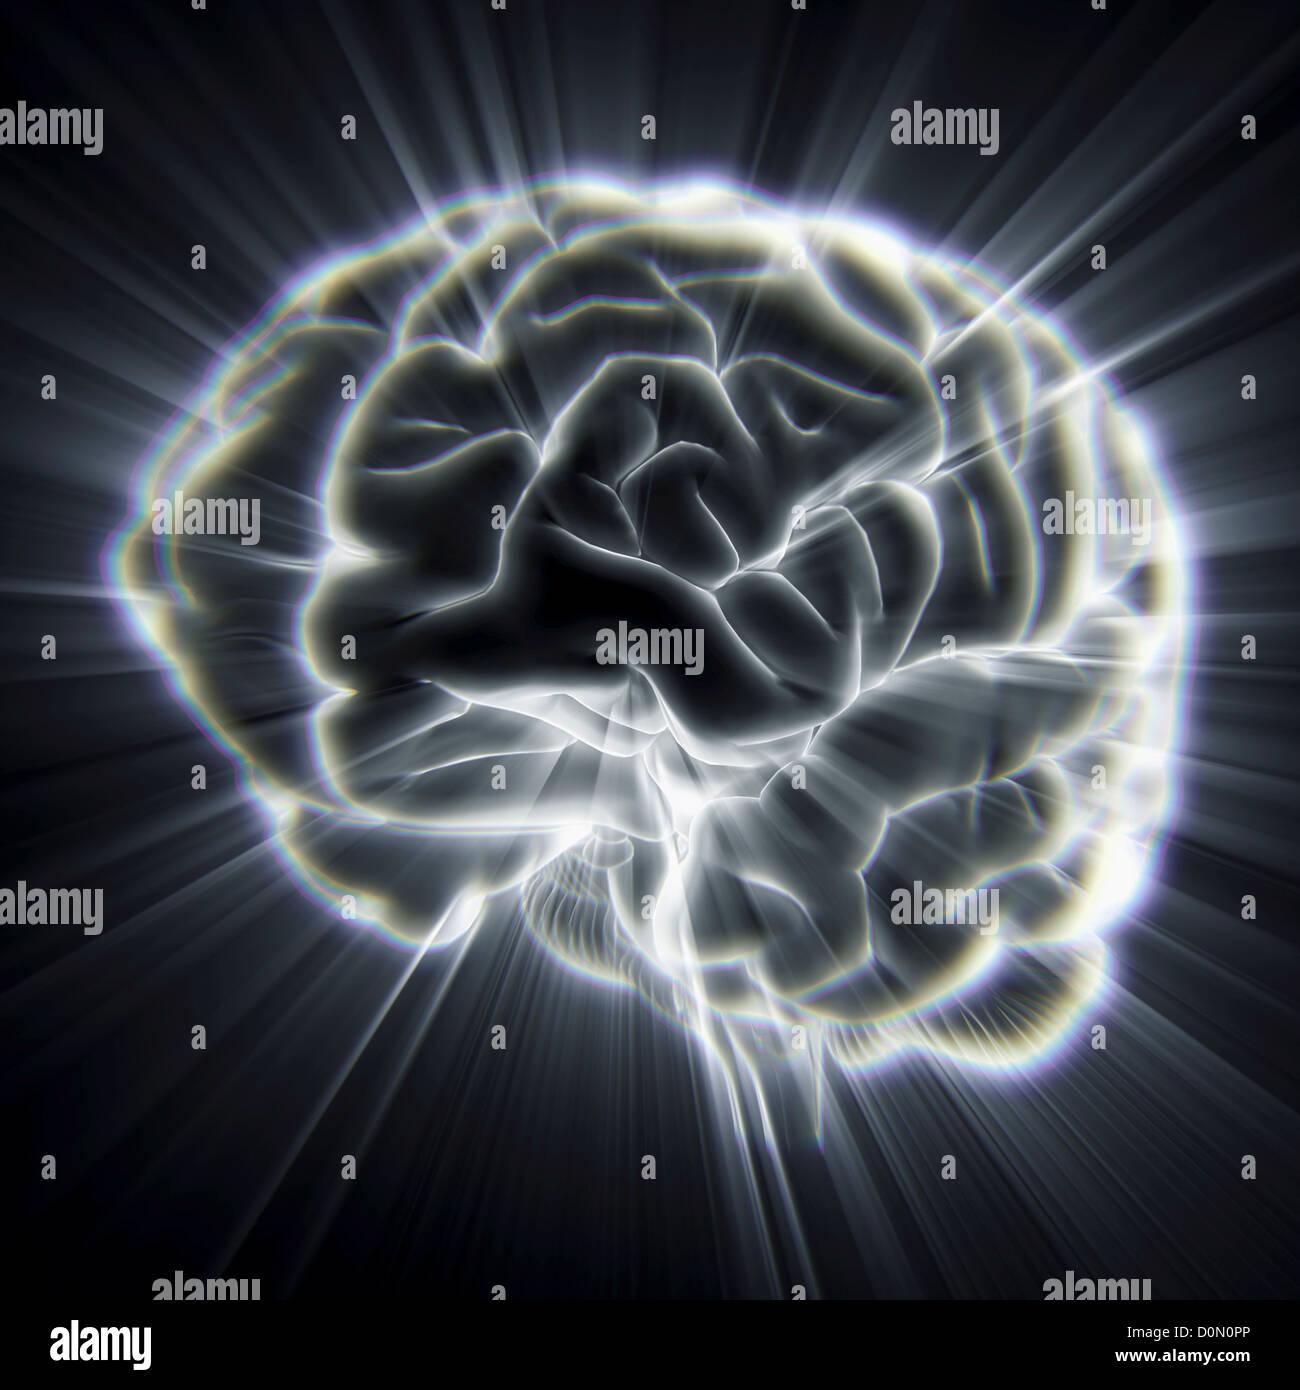 Diagram of the human brain emanating light beams. - Stock Image